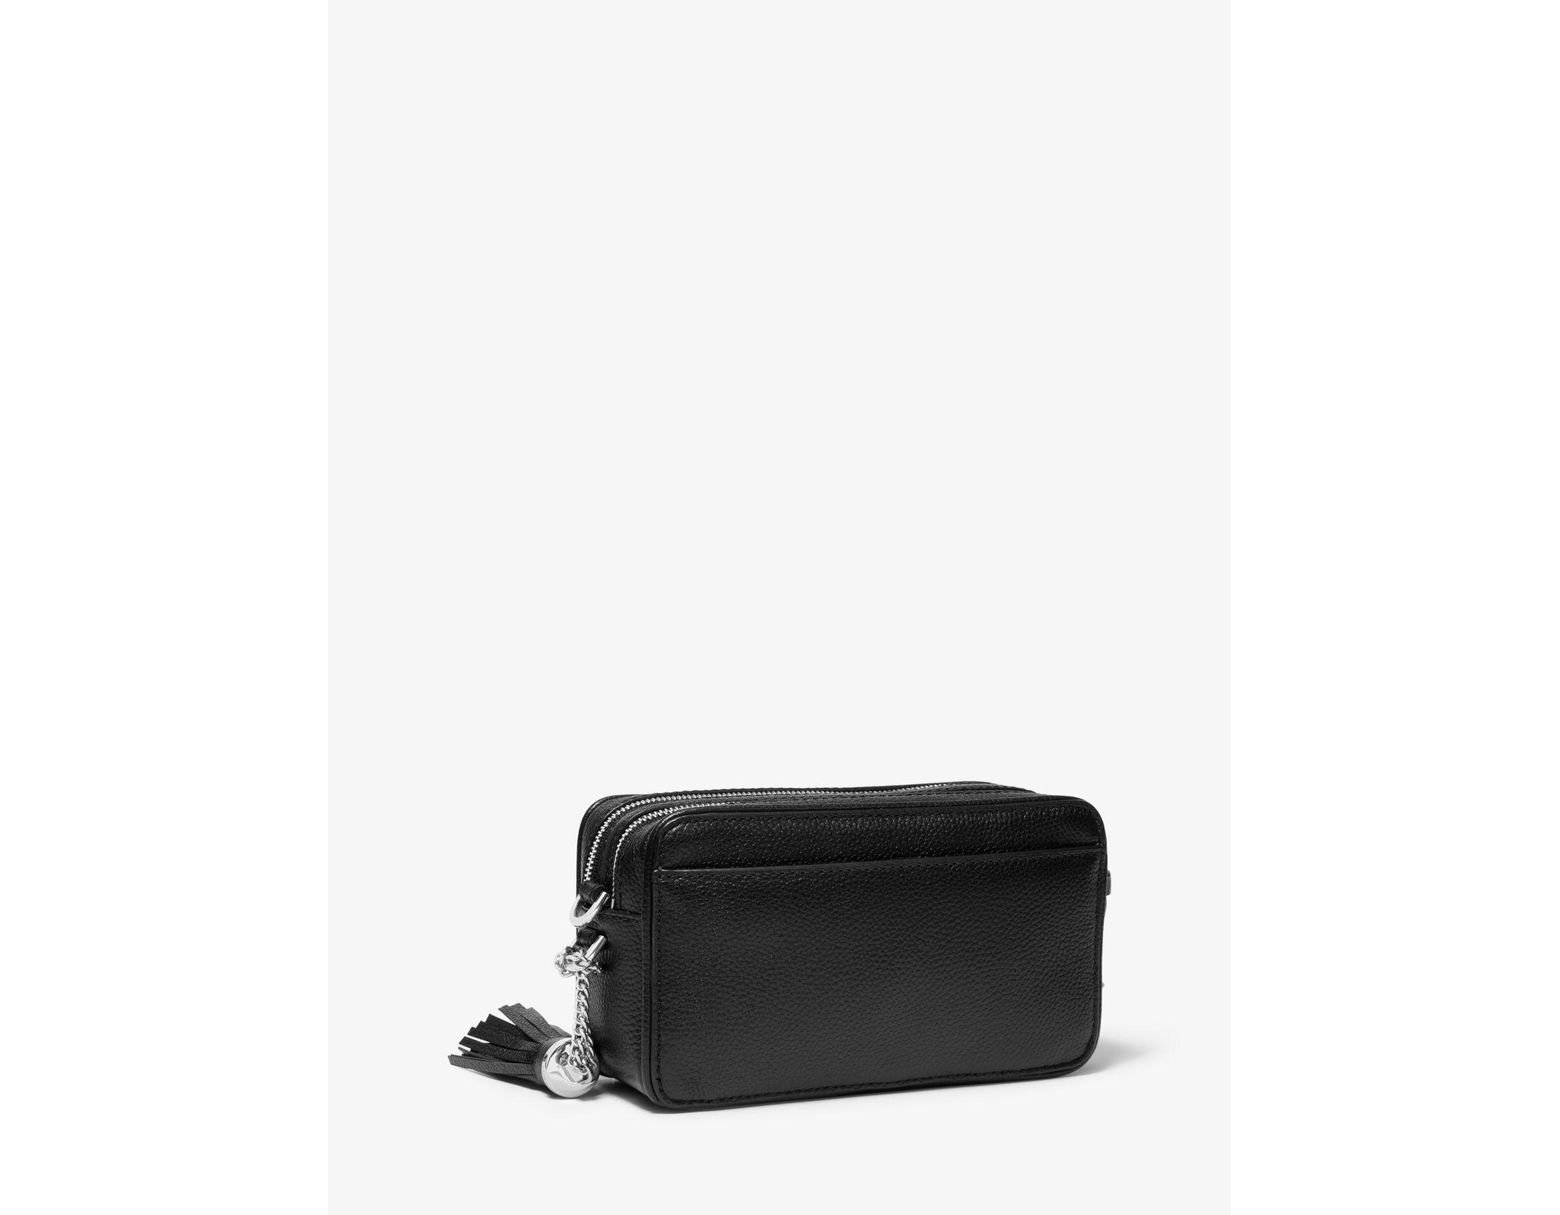 15f3ec18b Michael Kors Small Striped Leather Camera Crossbody in Black - Save 39% -  Lyst